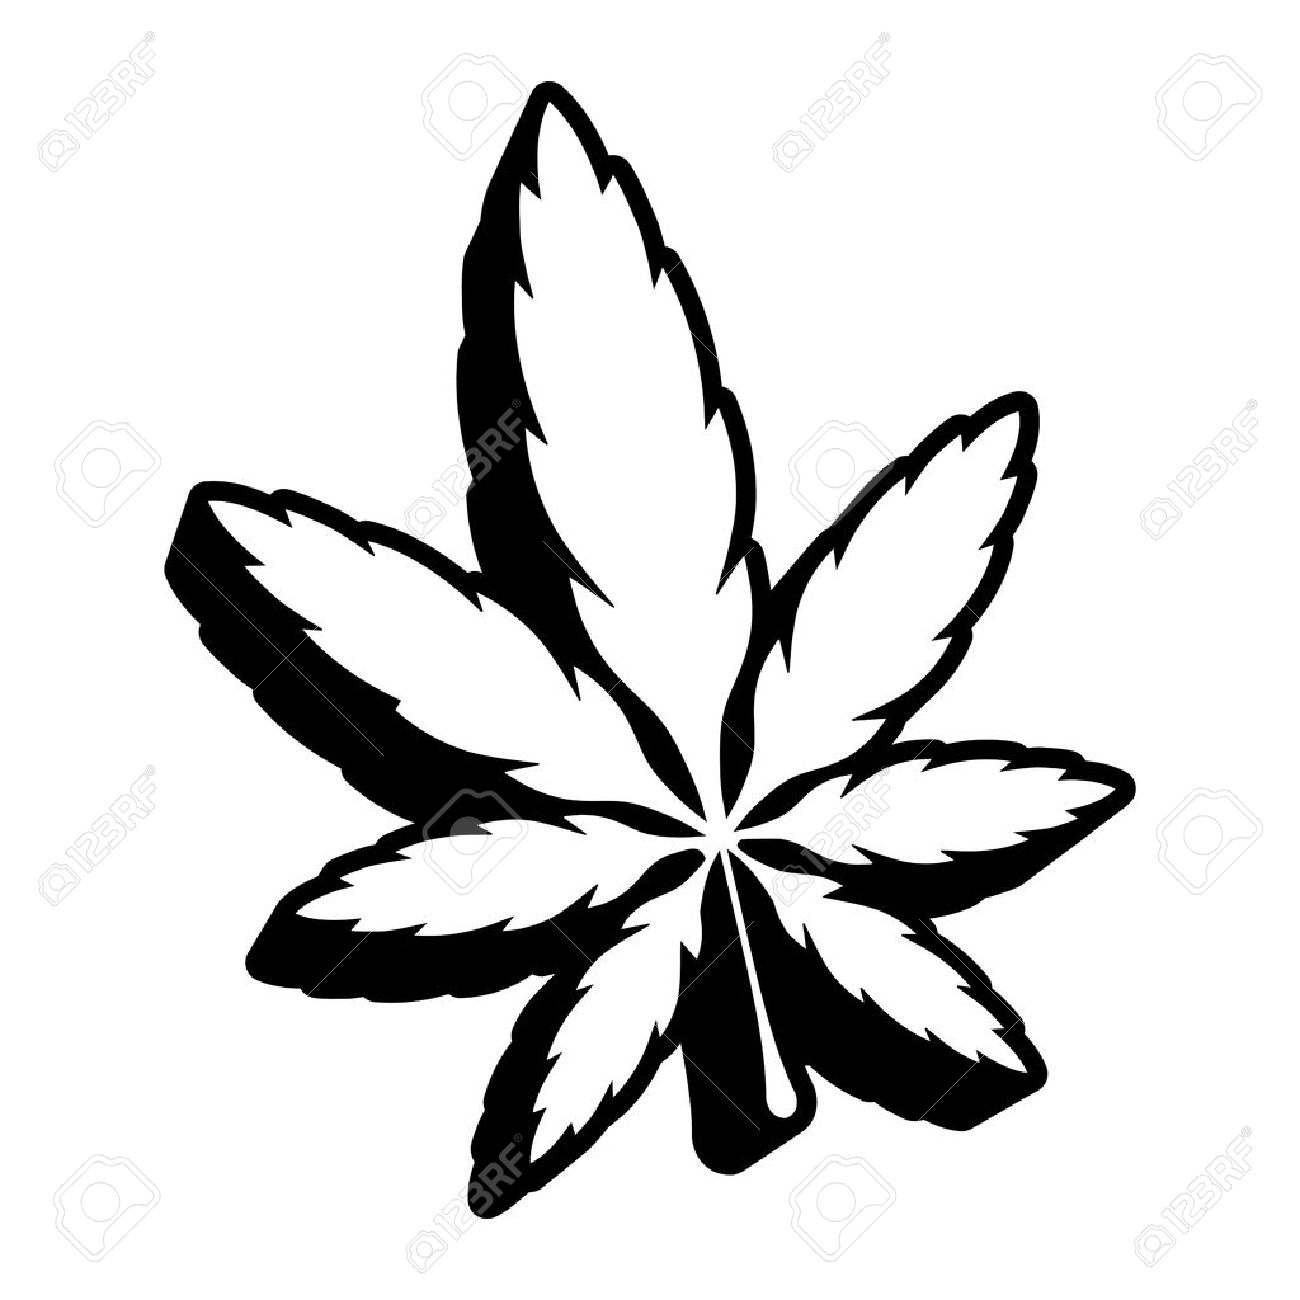 1300x1300 Drawn Marijuana Leaf Vector